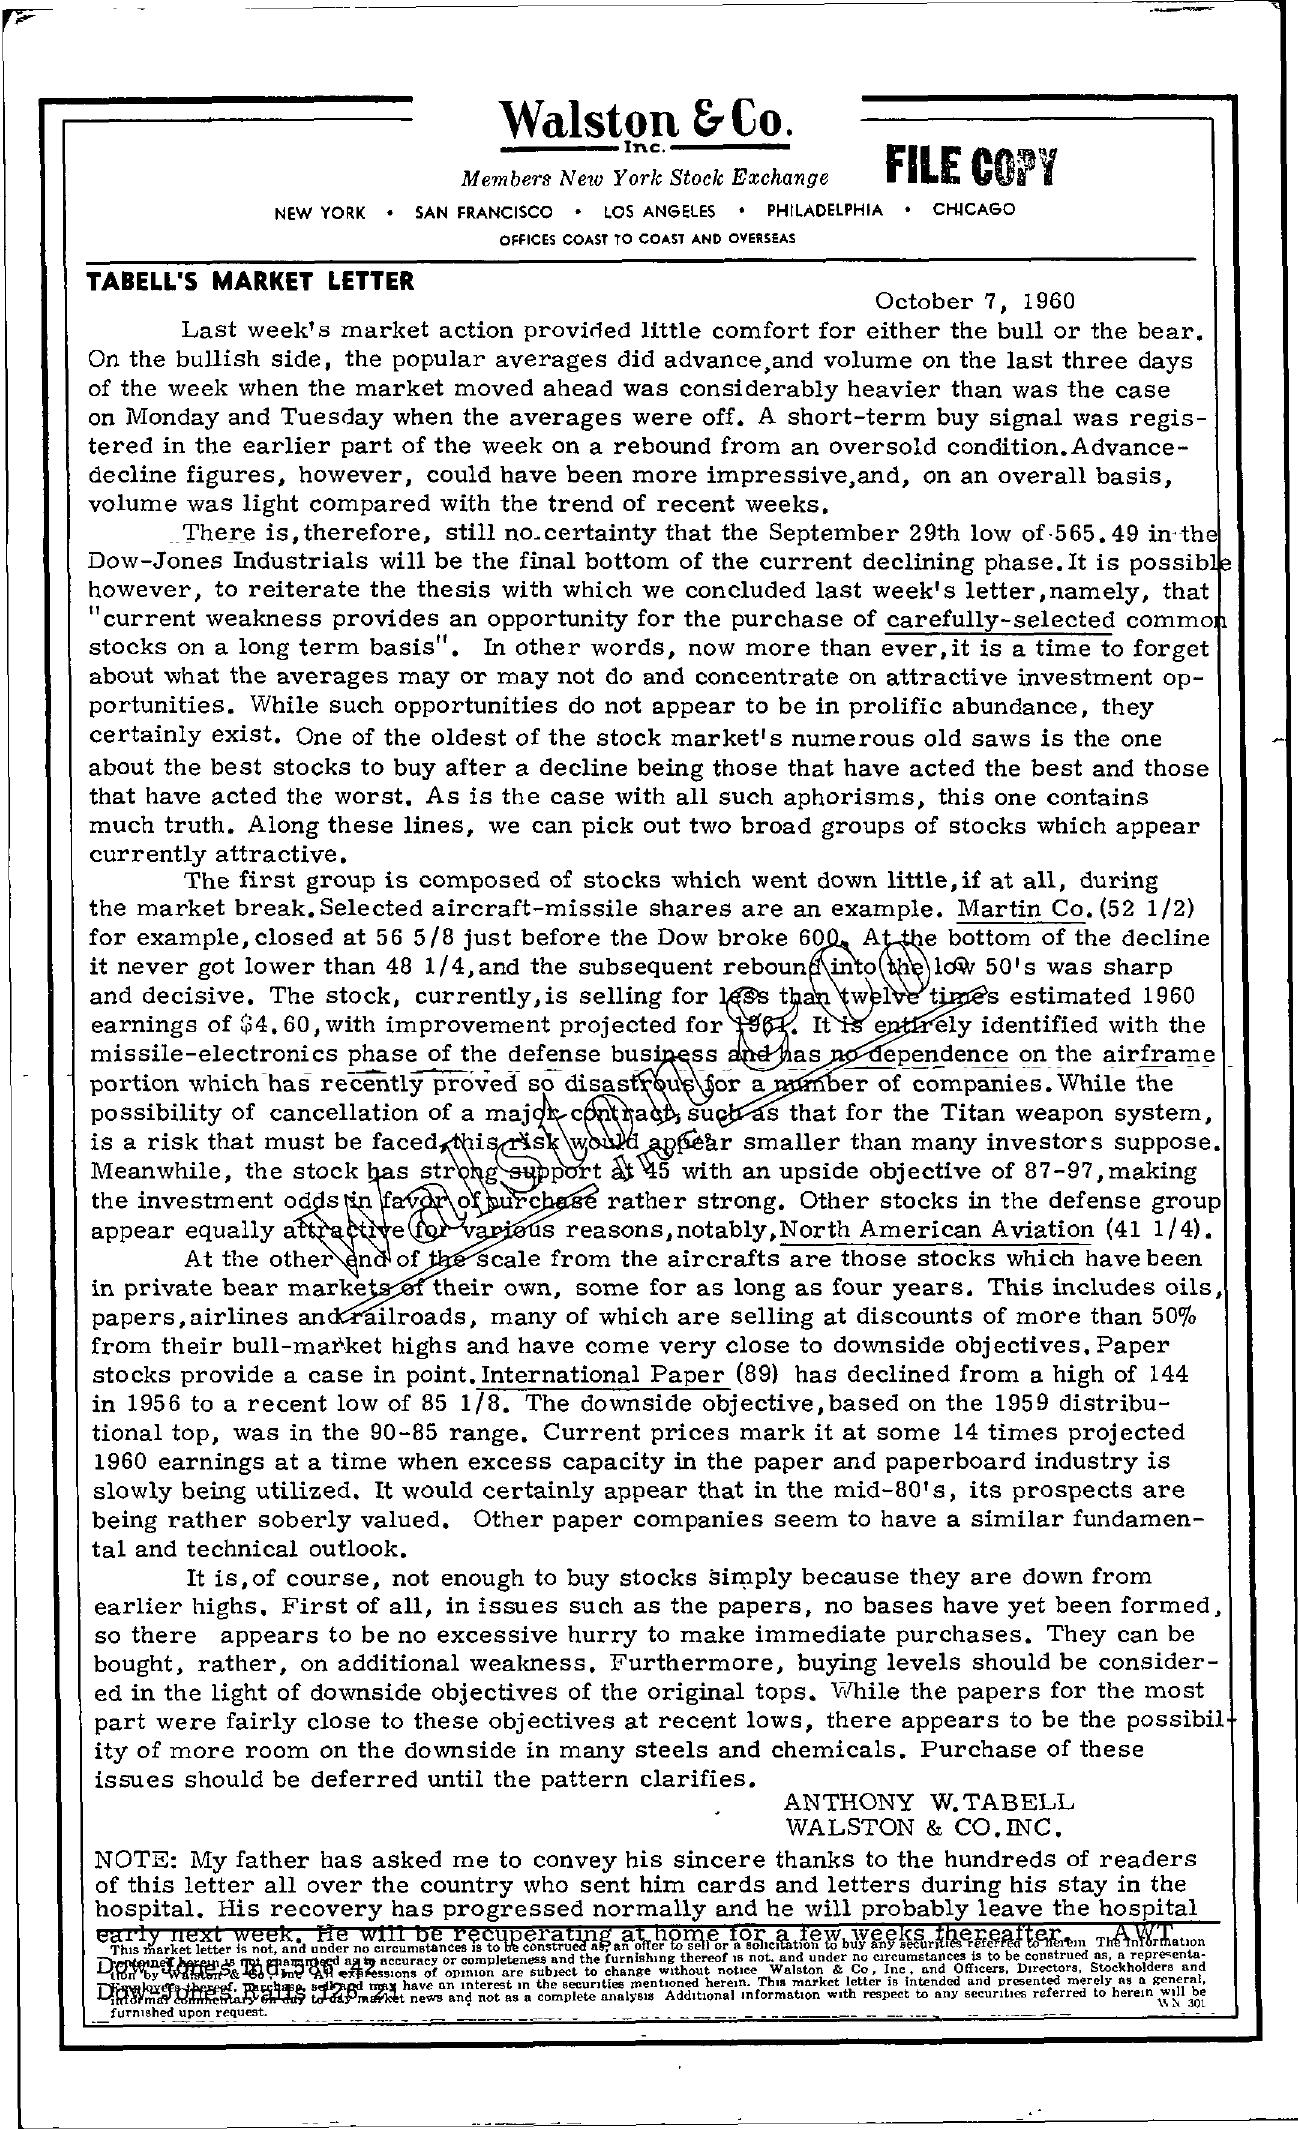 Tabell's Market Letter - October 07, 1960